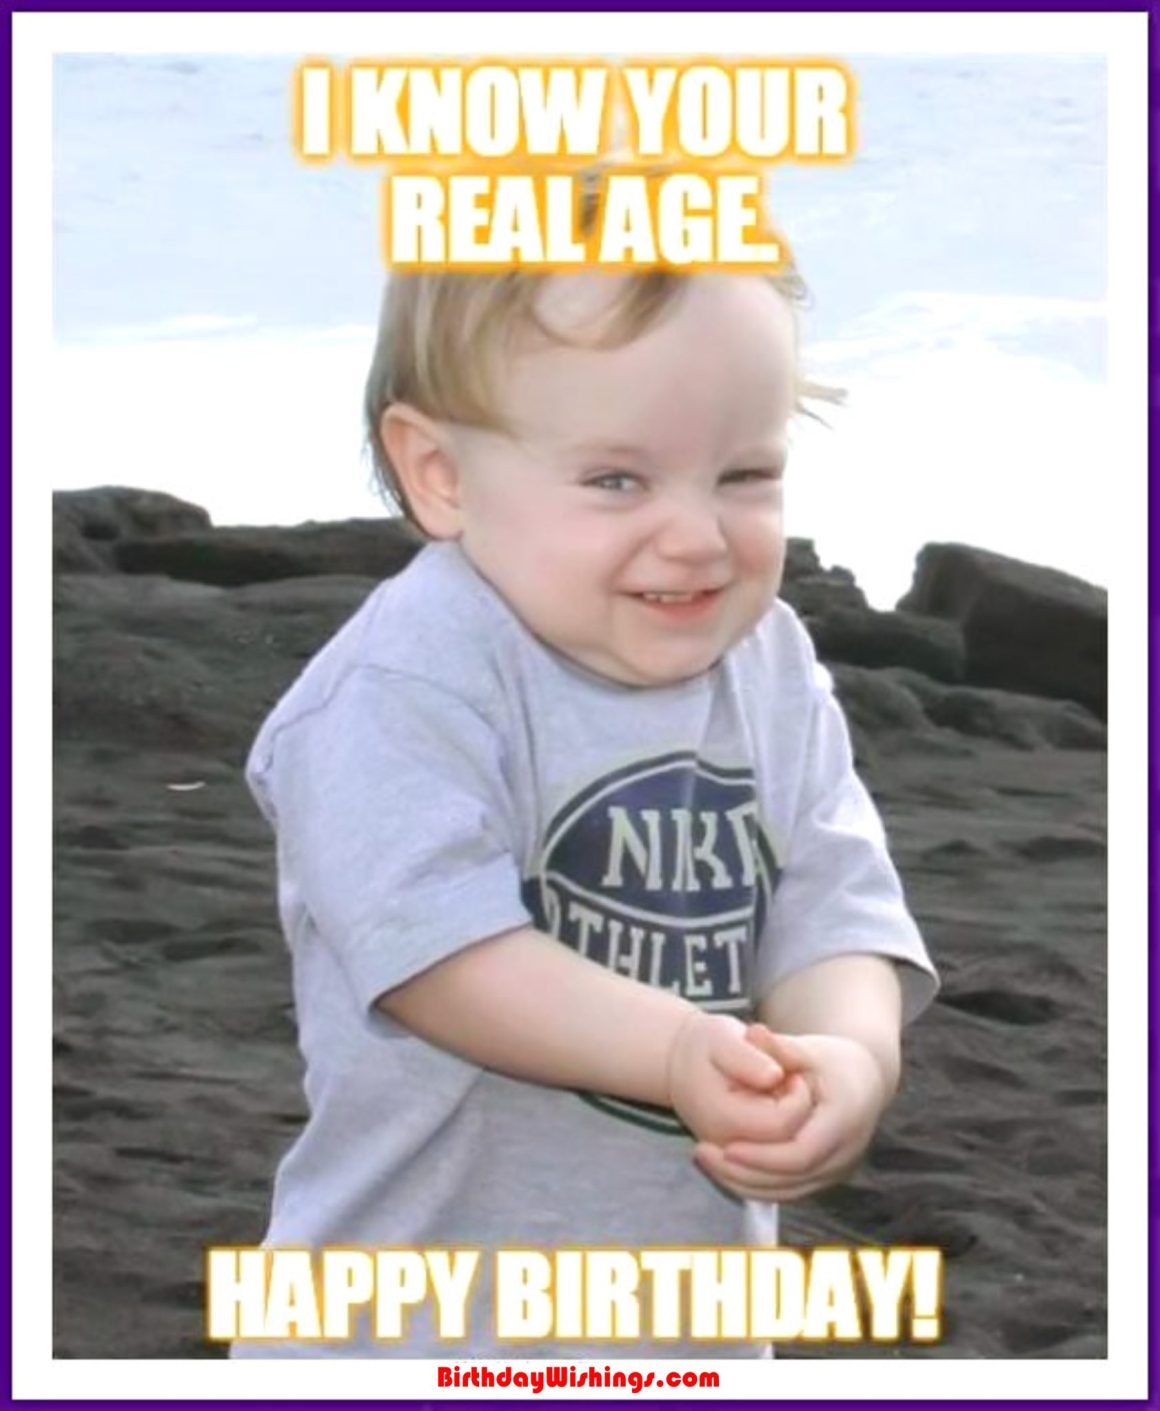 Funny & Famous People Birthday Memes - BirthdayWishings.com